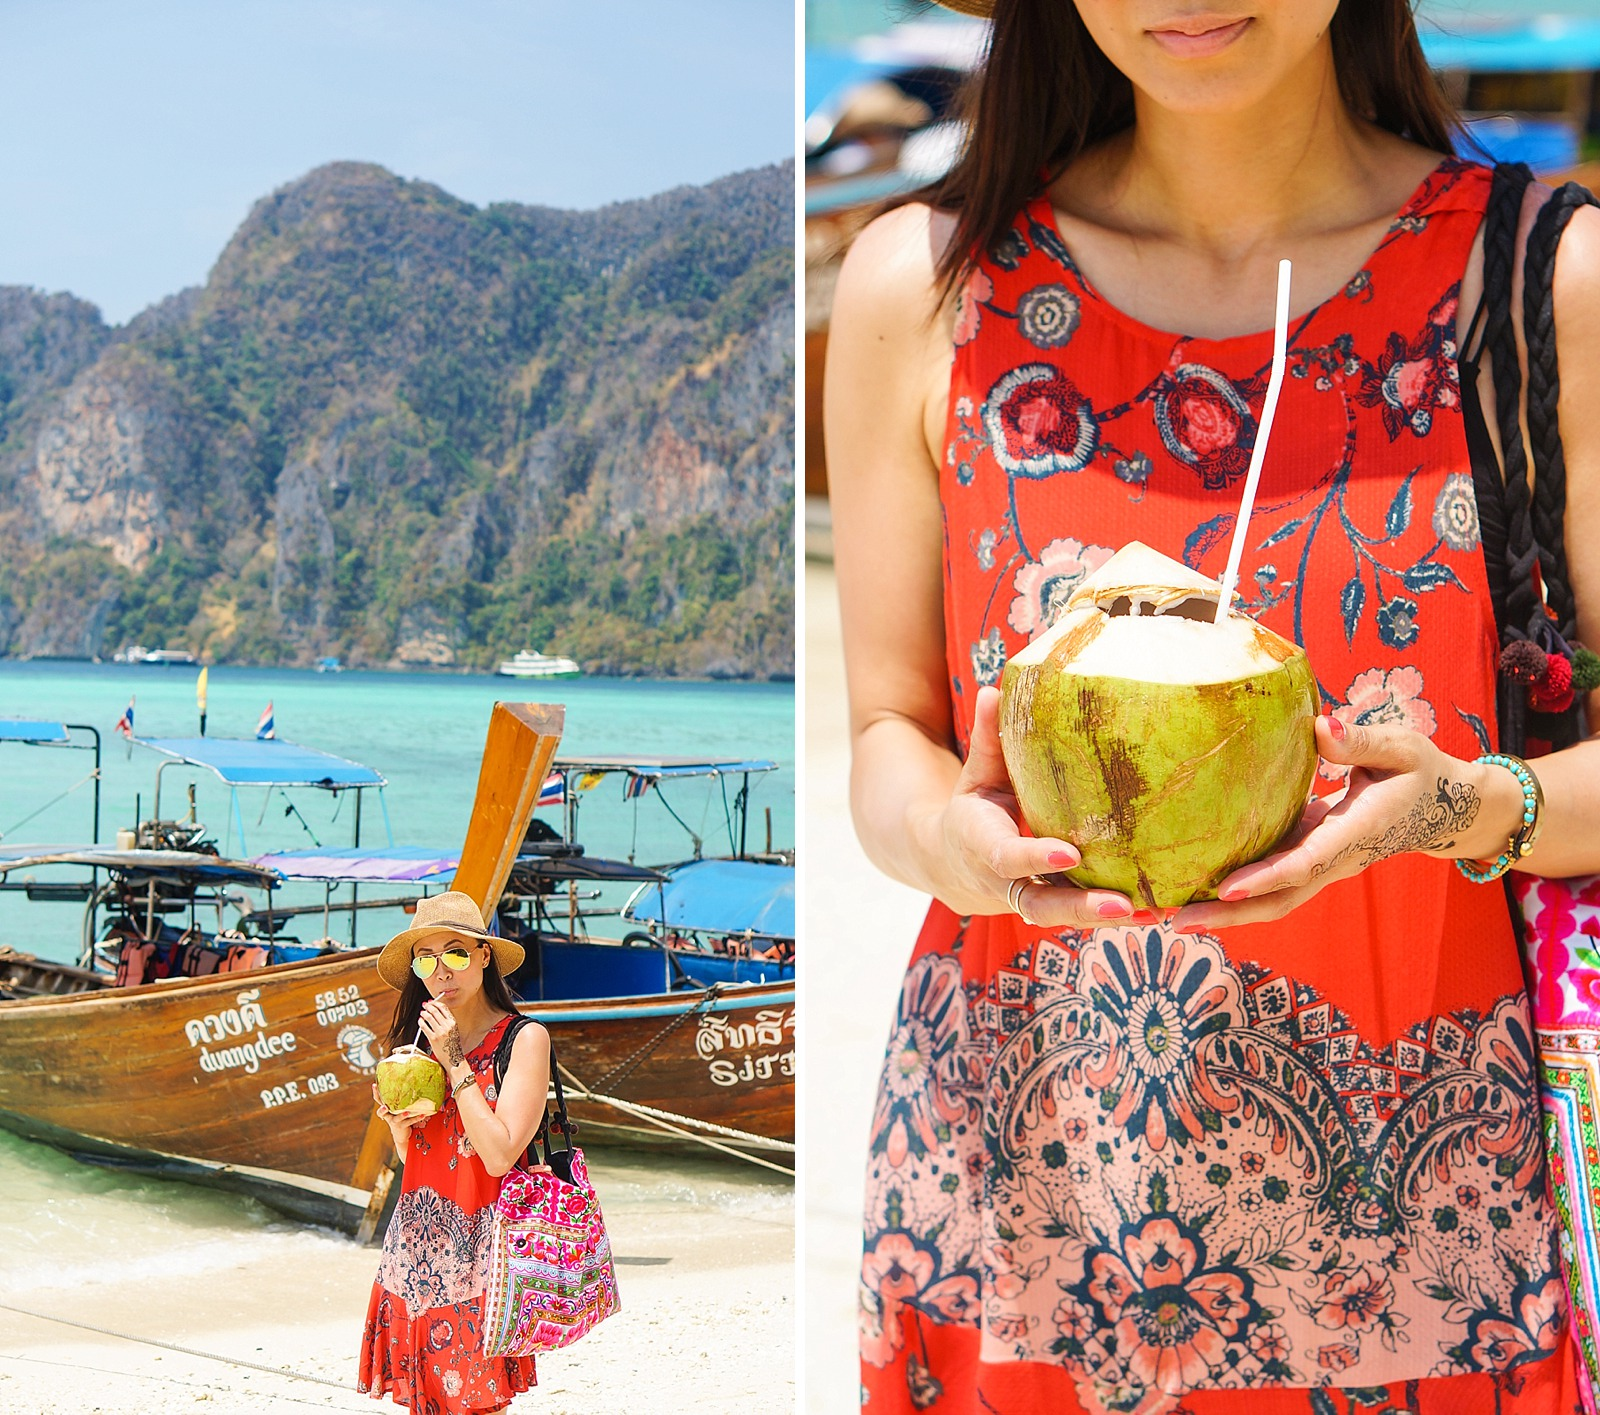 Thailand-diana-elizabeth-travel-blogger-phoenix-531